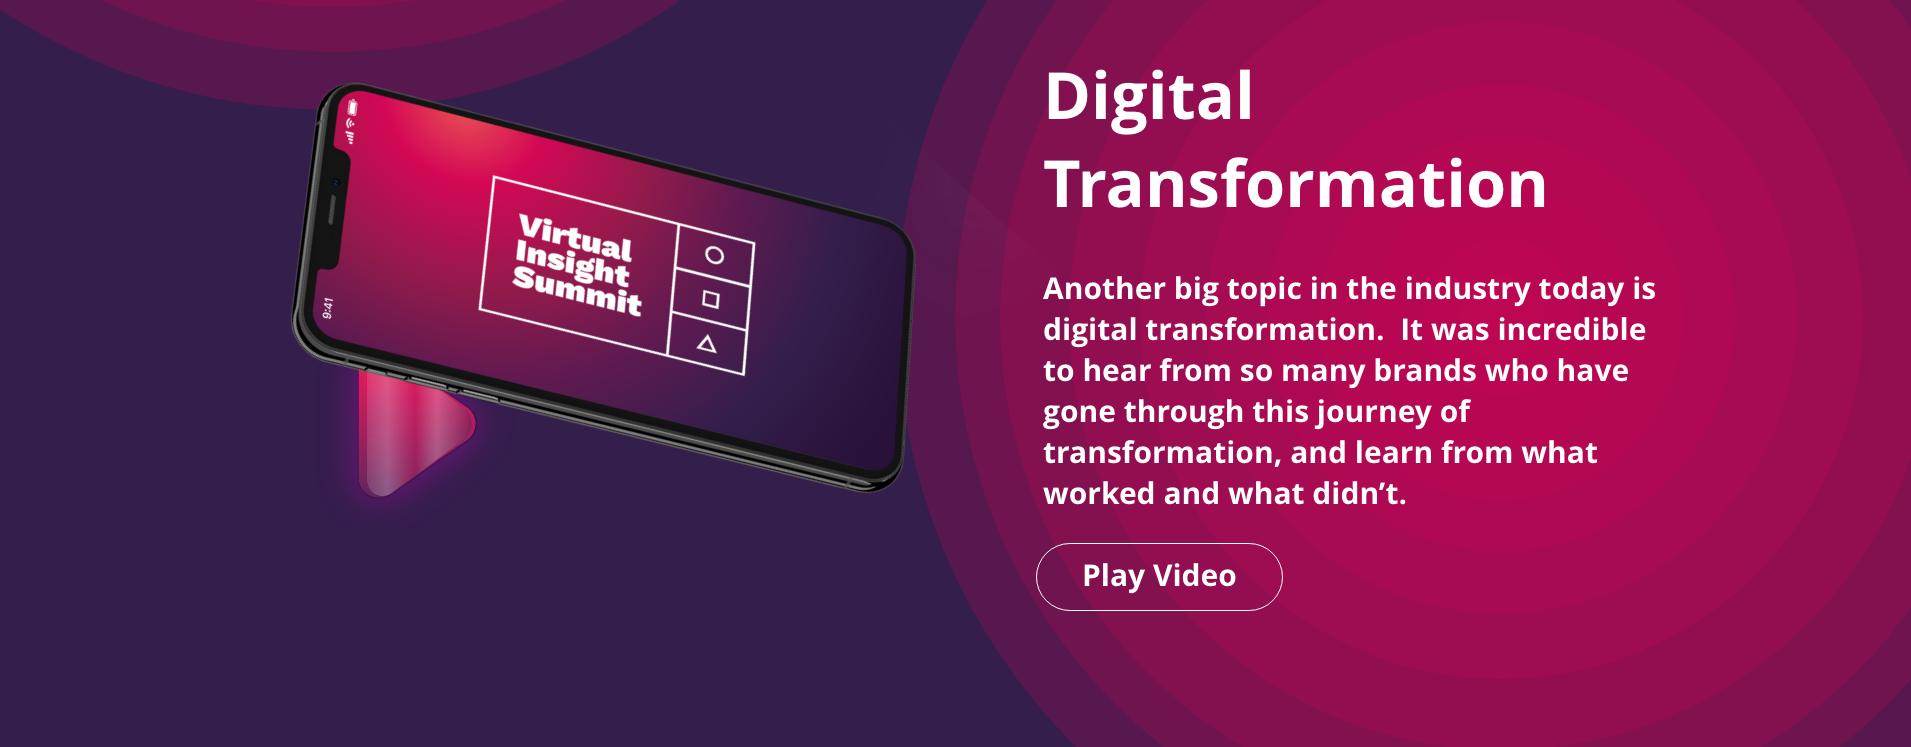 Theme 3 Digital Transformation